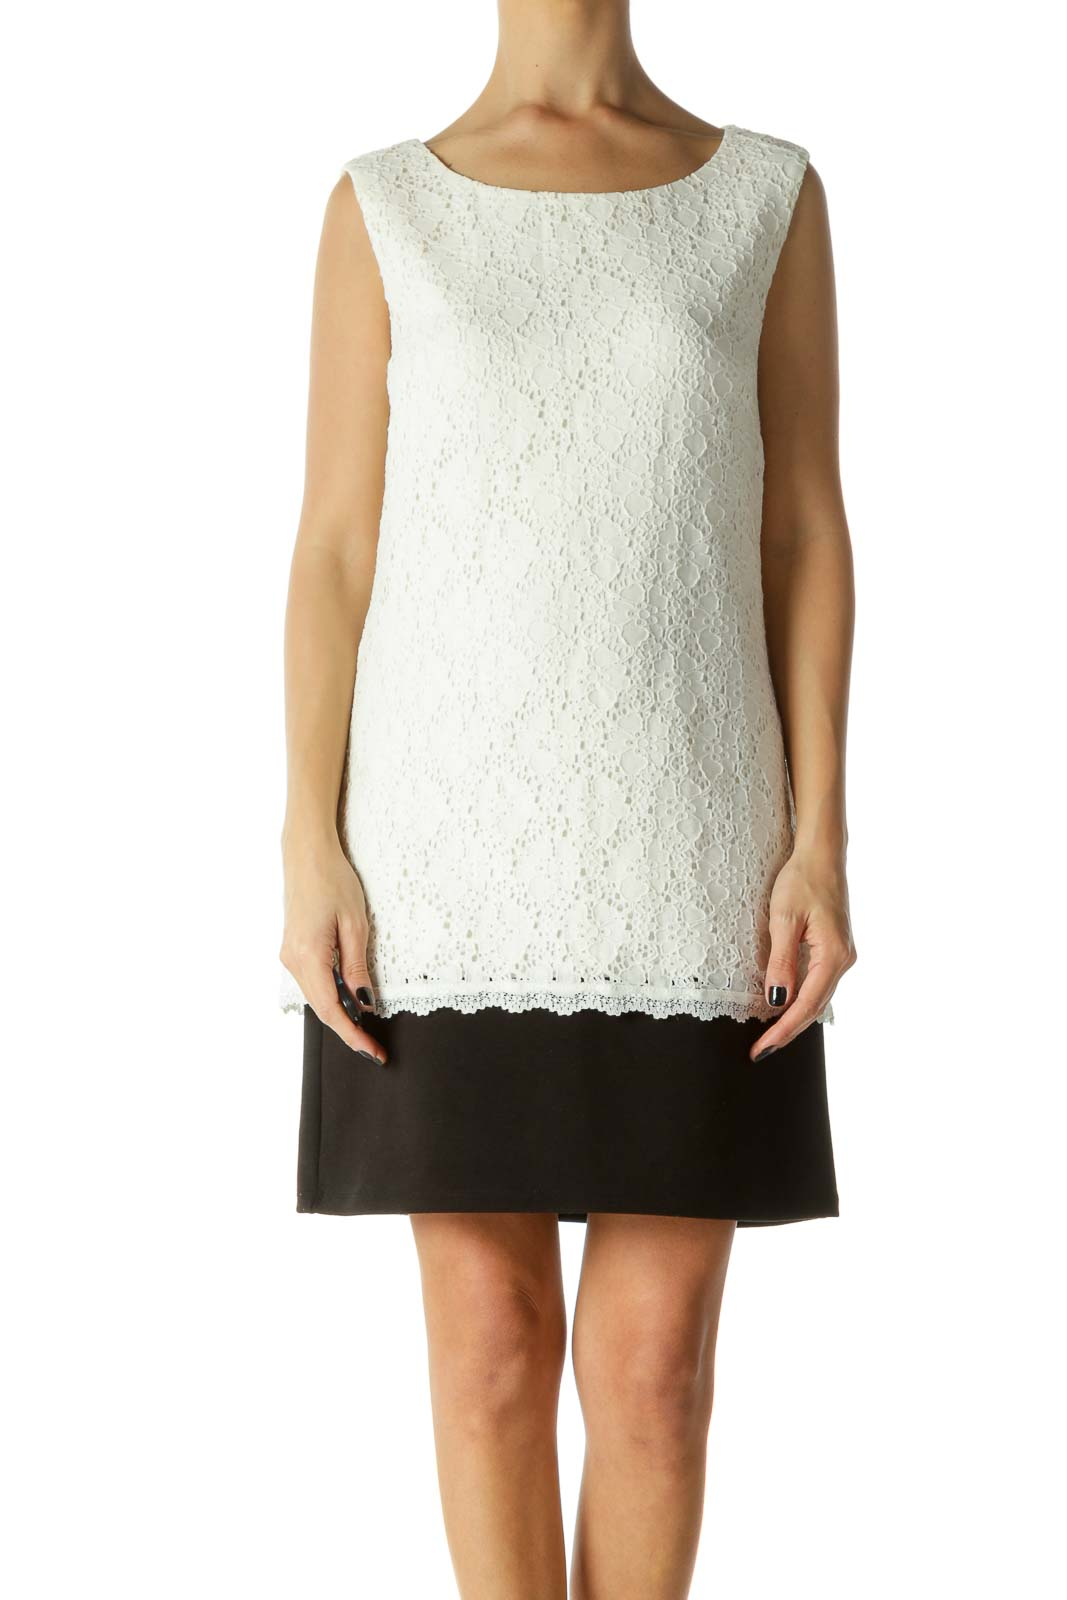 Black & White Color Block Lace Day Dress Front